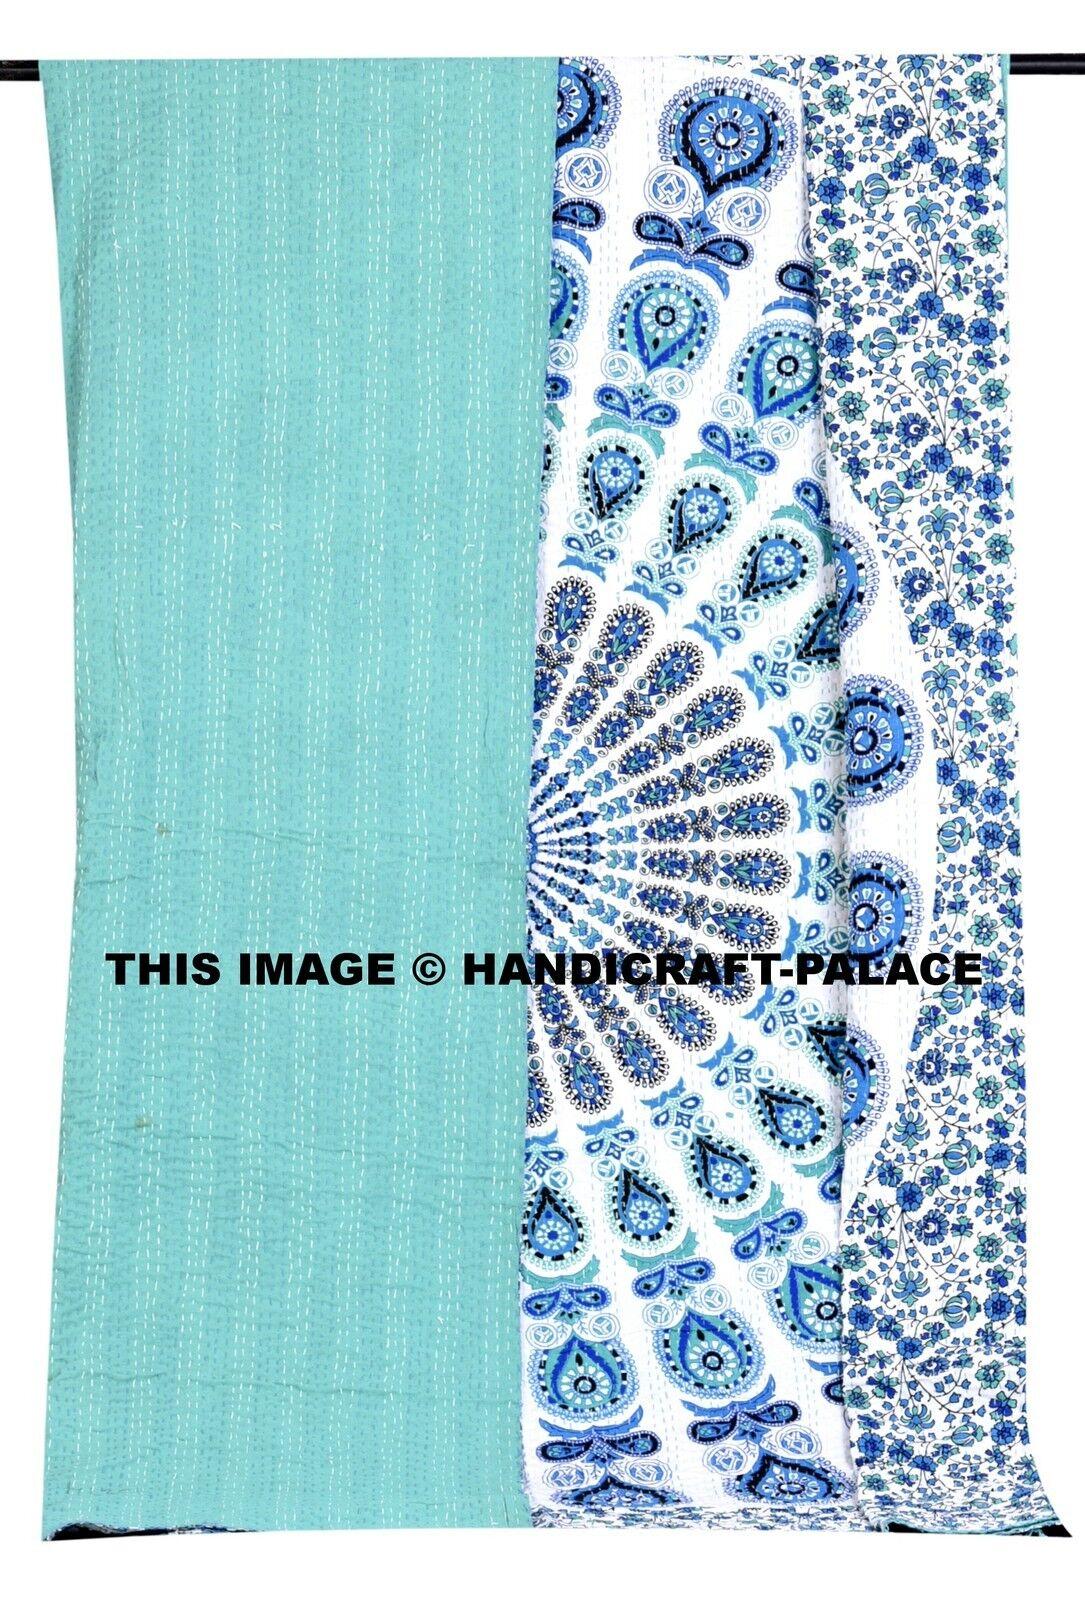 Mandala Indian Kantha Bedspread Handmade Quilt Throw 100% Cotton Blanket Queen